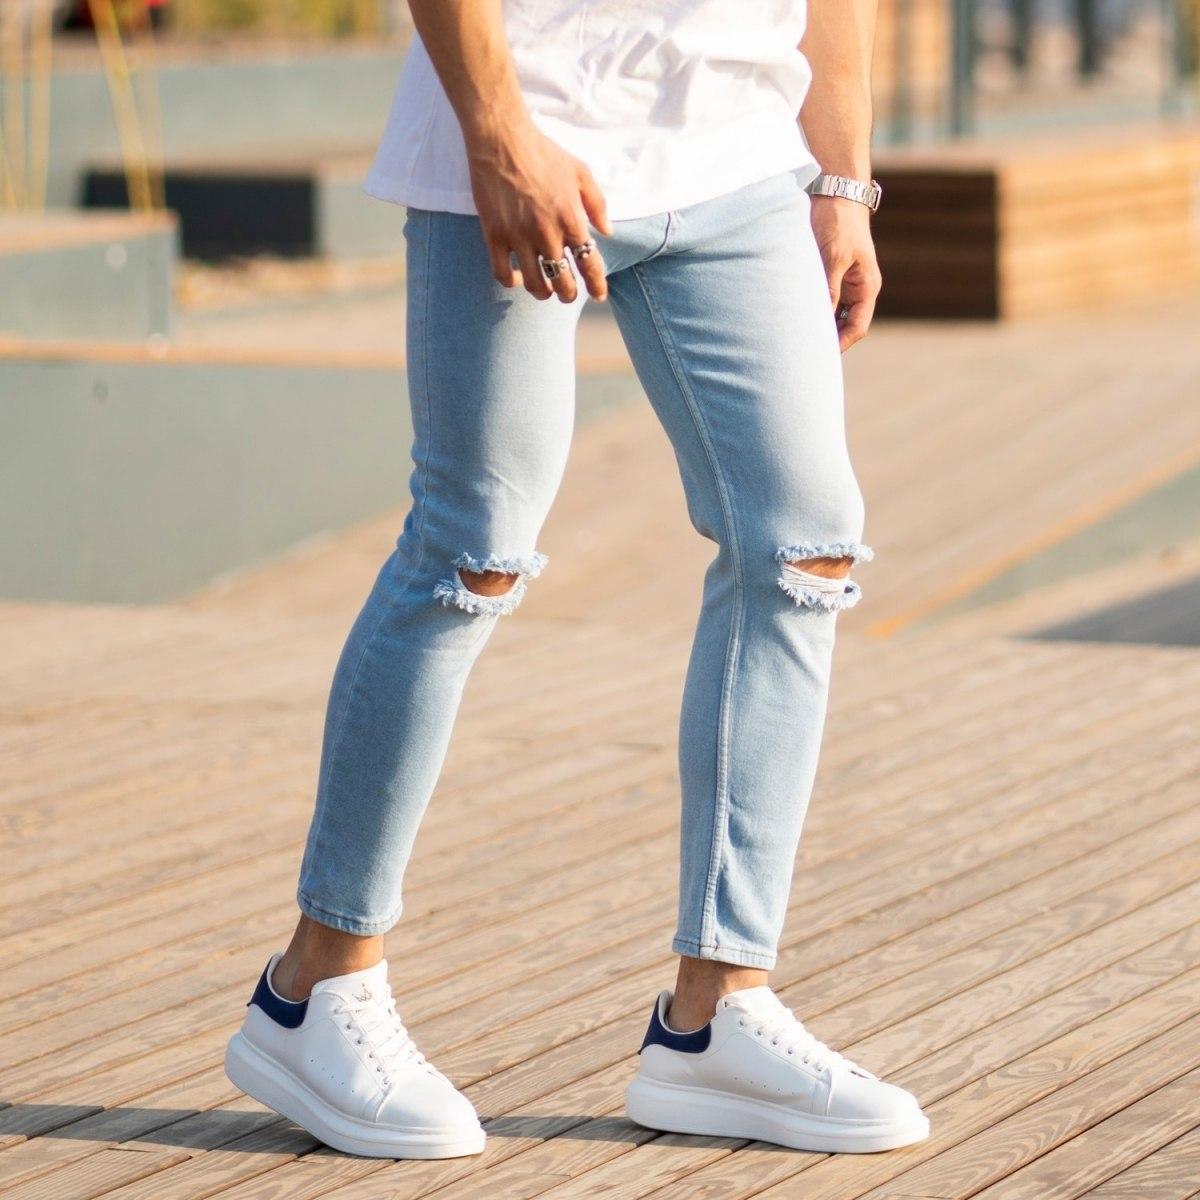 Men's Light-Blue Jeans With Rips Mv Premium Brand - 2